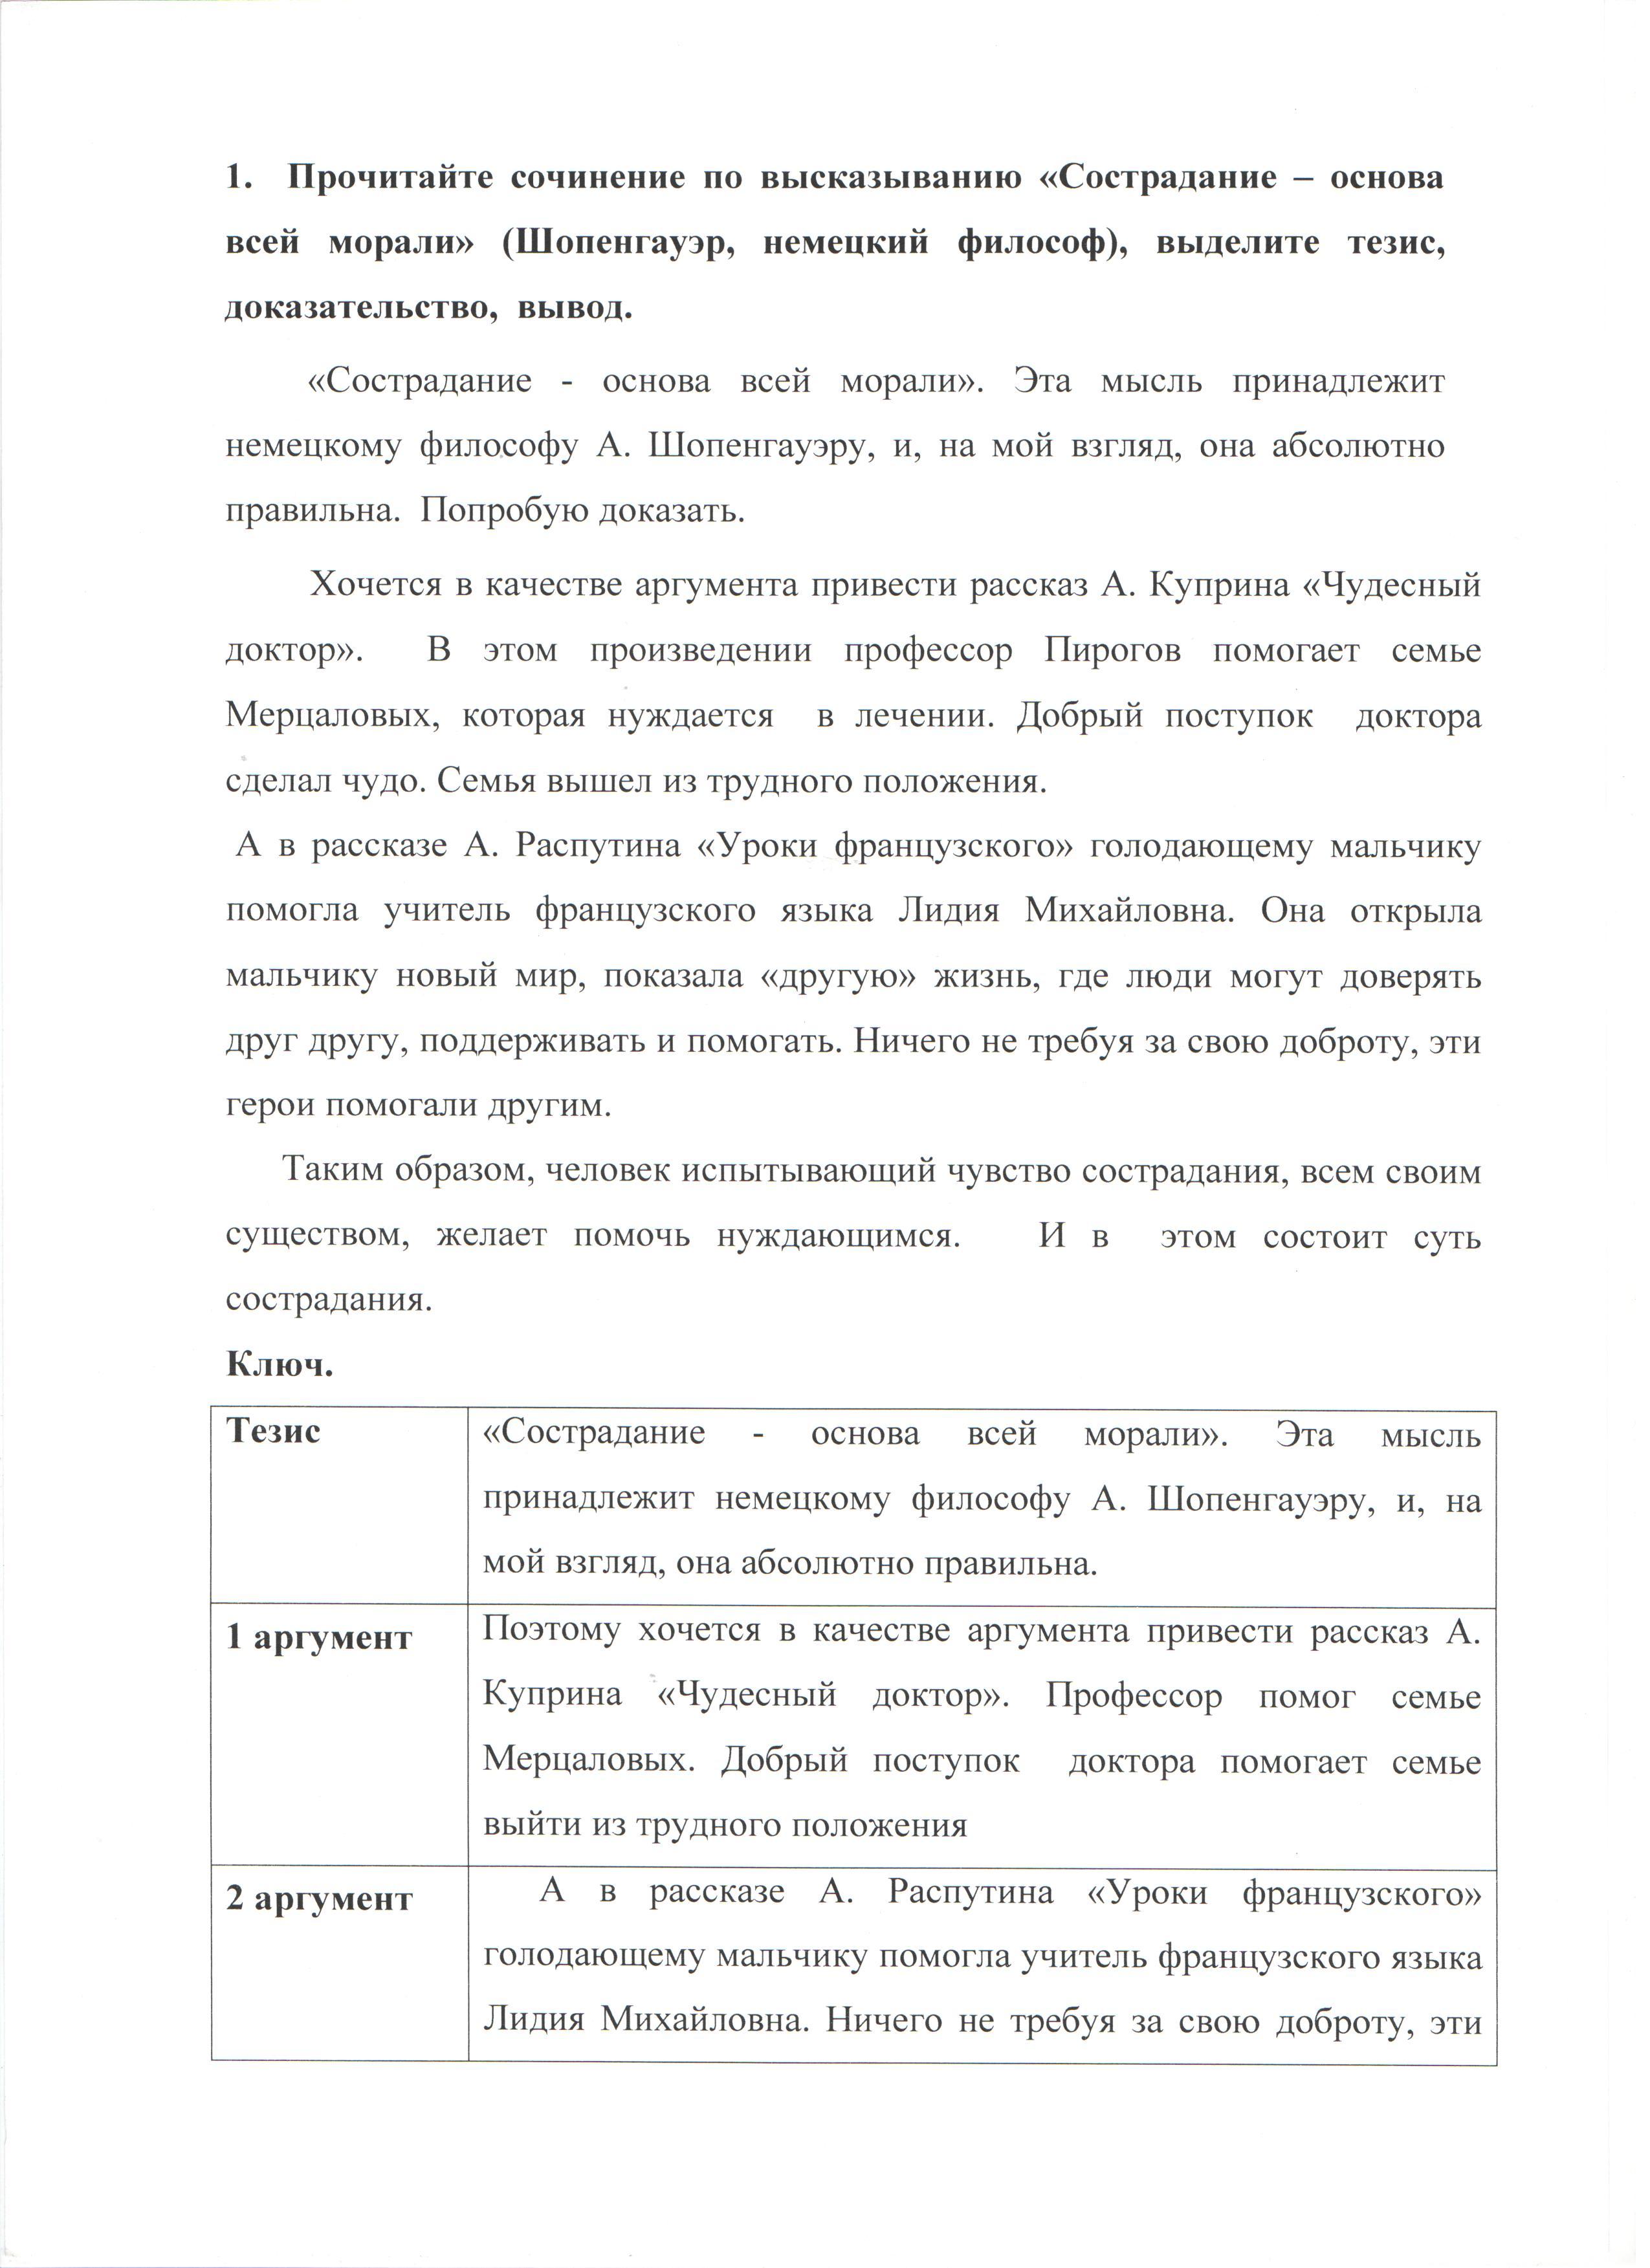 C:\Documents and Settings\Admin\Мои документы\Мои рисунки\Изображение 006.jpg